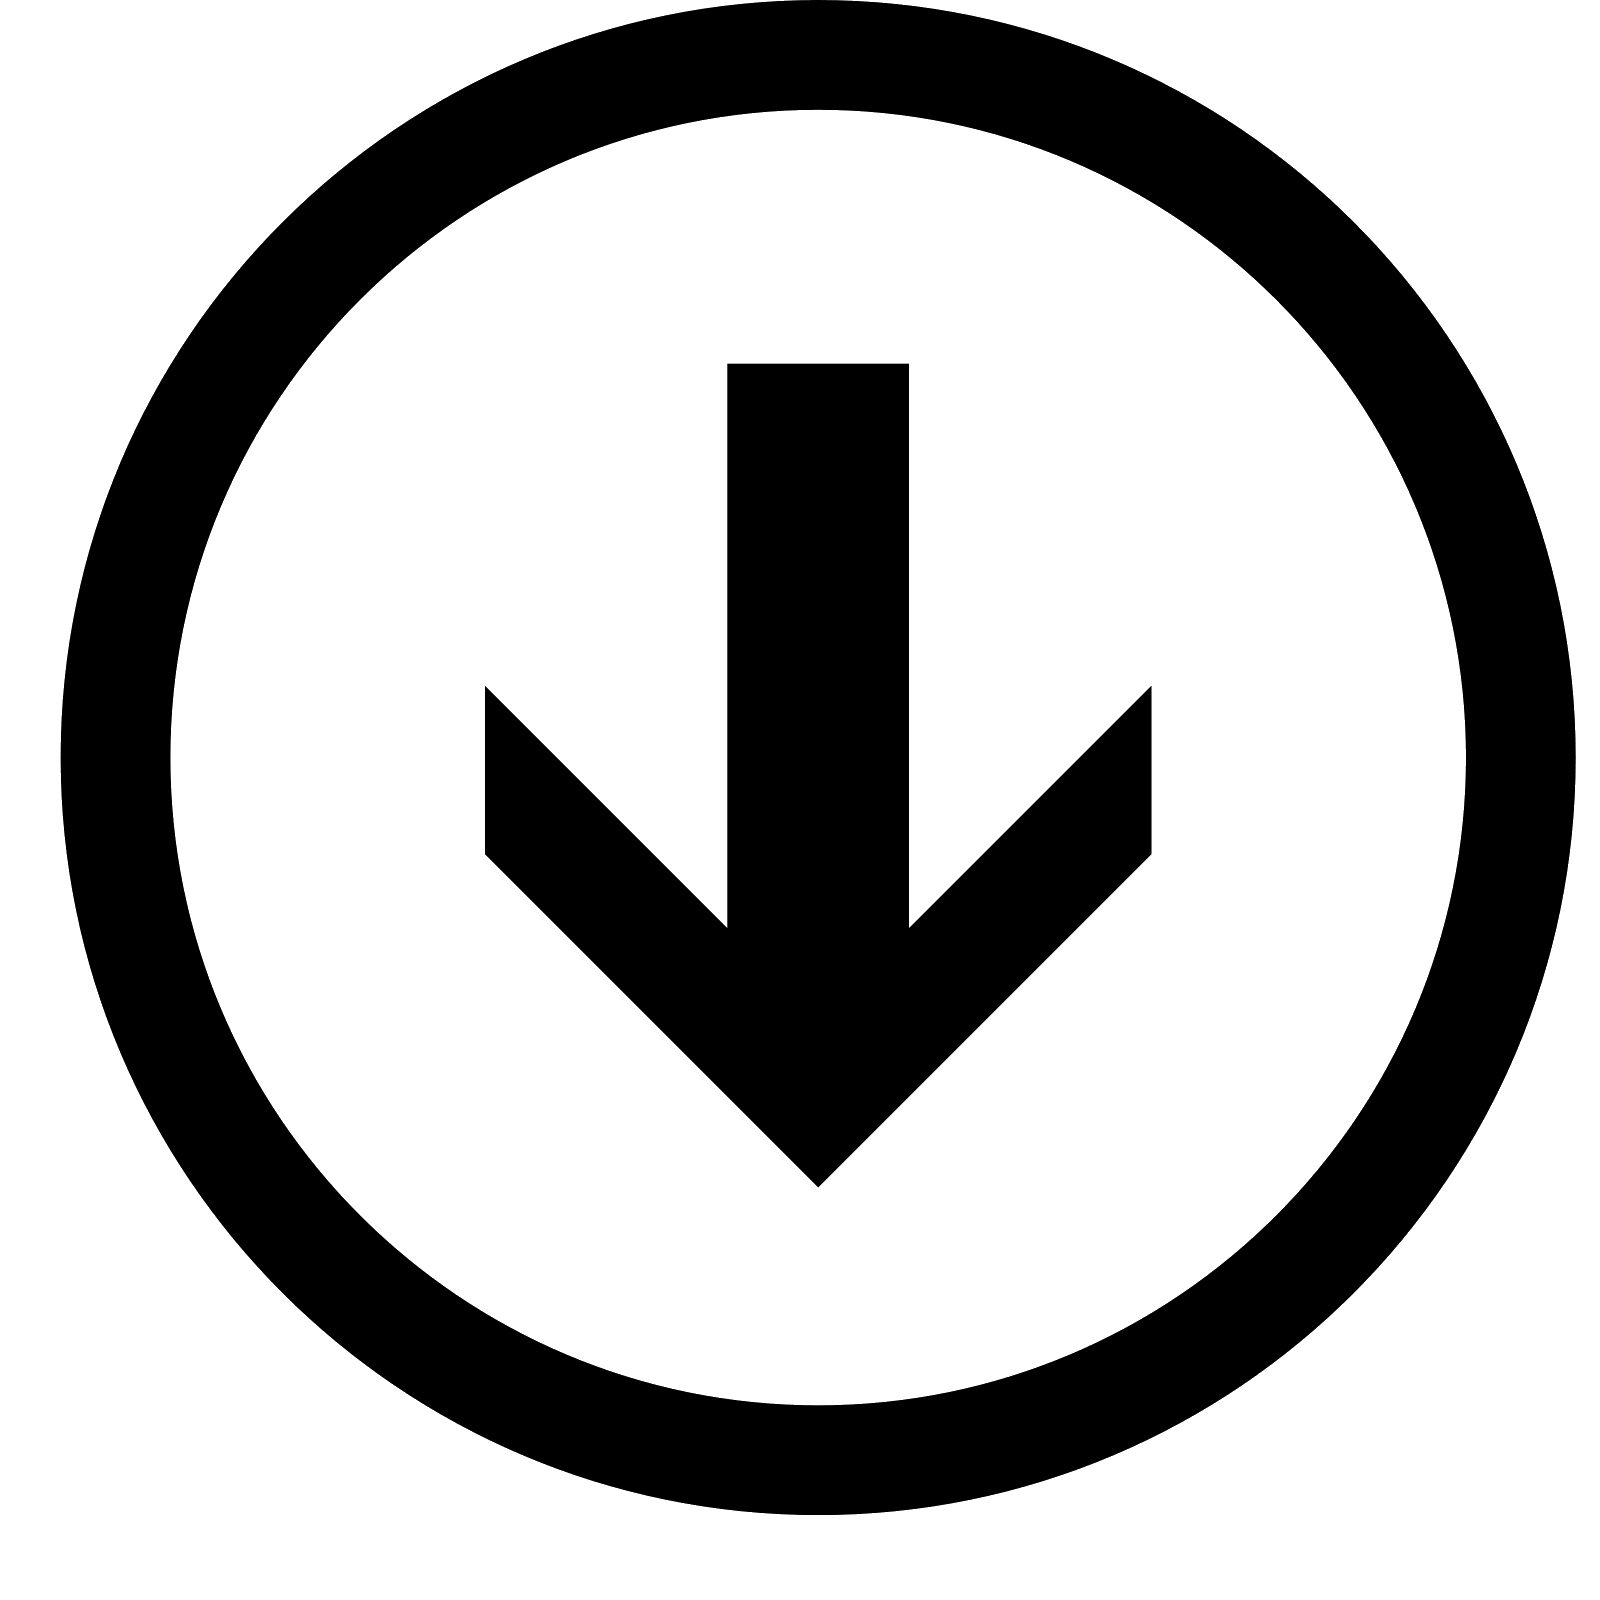 1600x1600 Scroll Down Icon